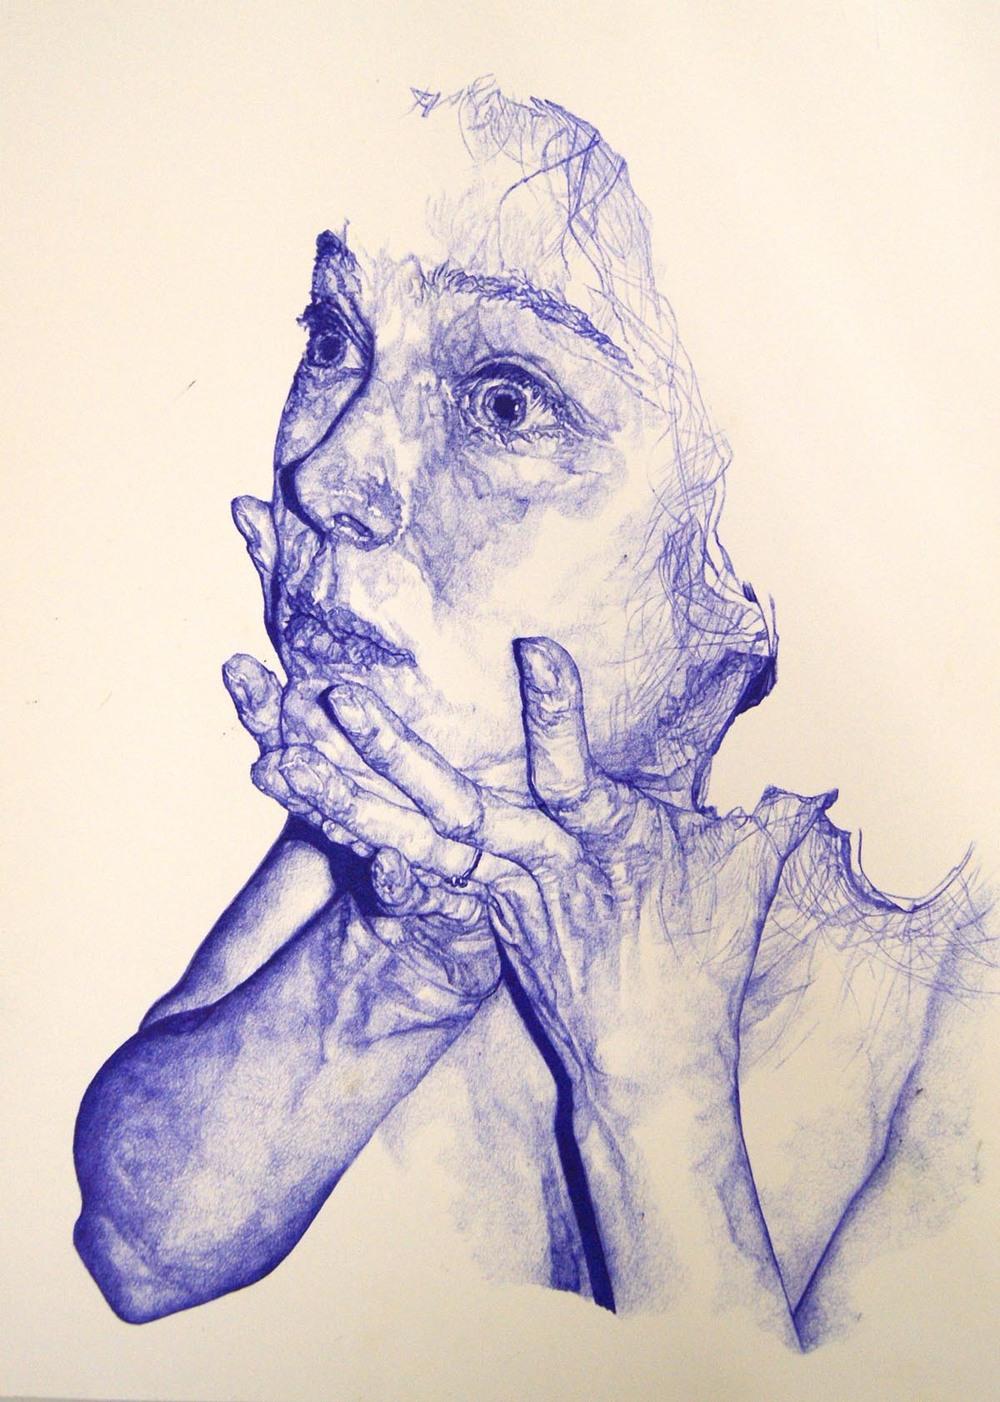 Sara Muirhead-untitled_ballpoint pen on paper_17x20.75 copy.JPG